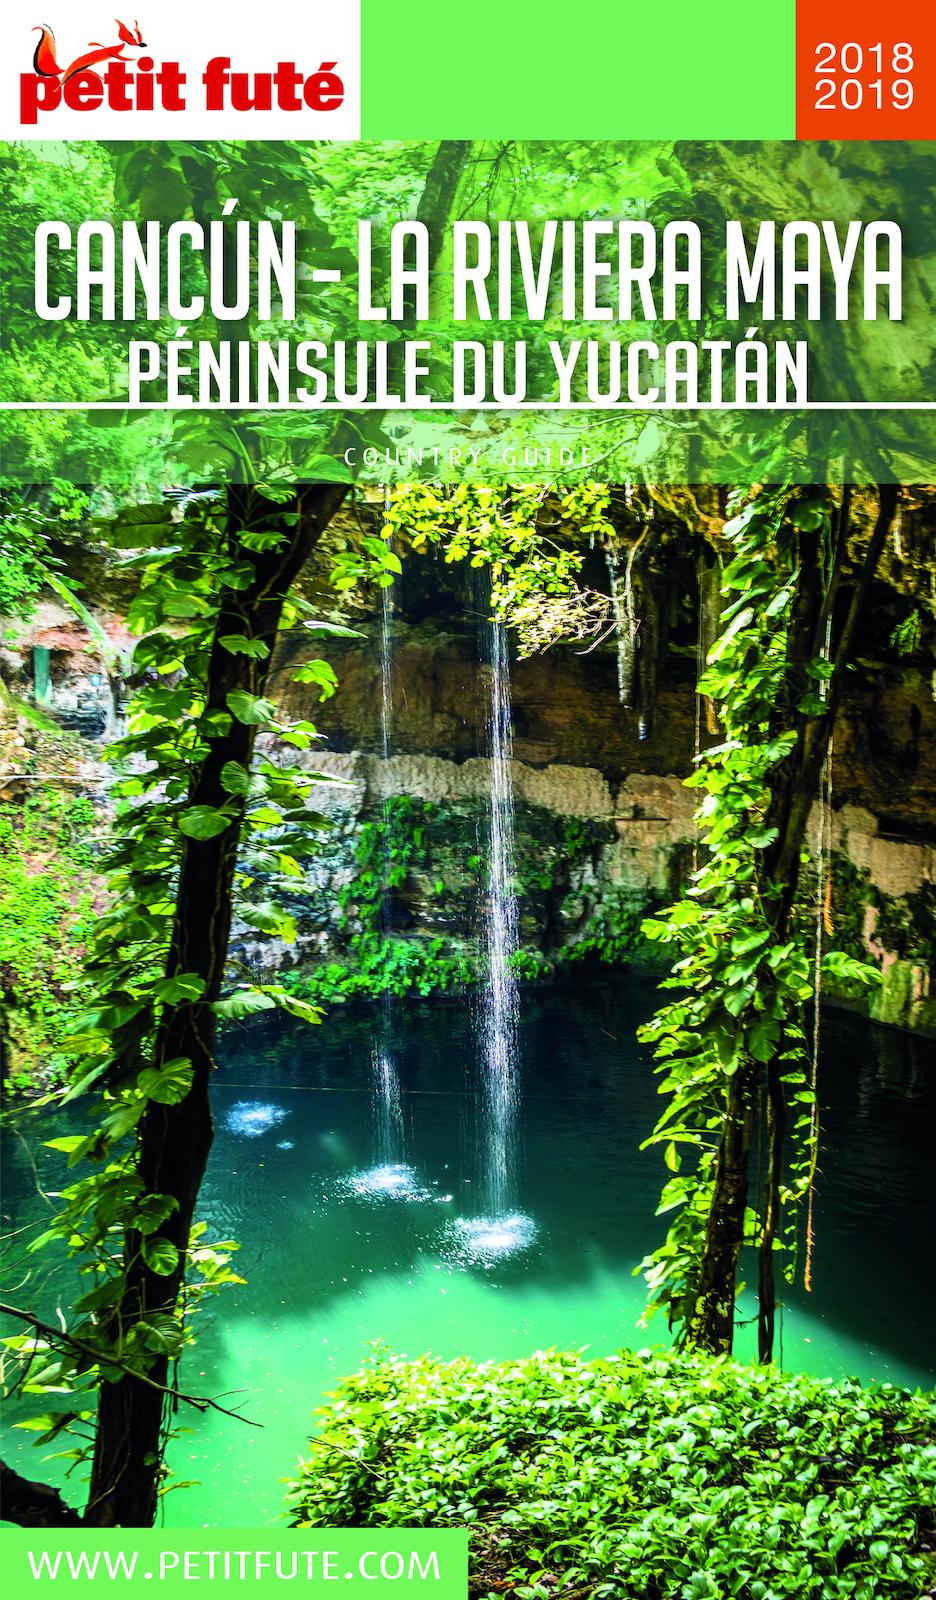 CANCÚN - LA RIVIERA MAYA / PÉNINSULE DU YUCATÁN 2019/2020 Petit Futé